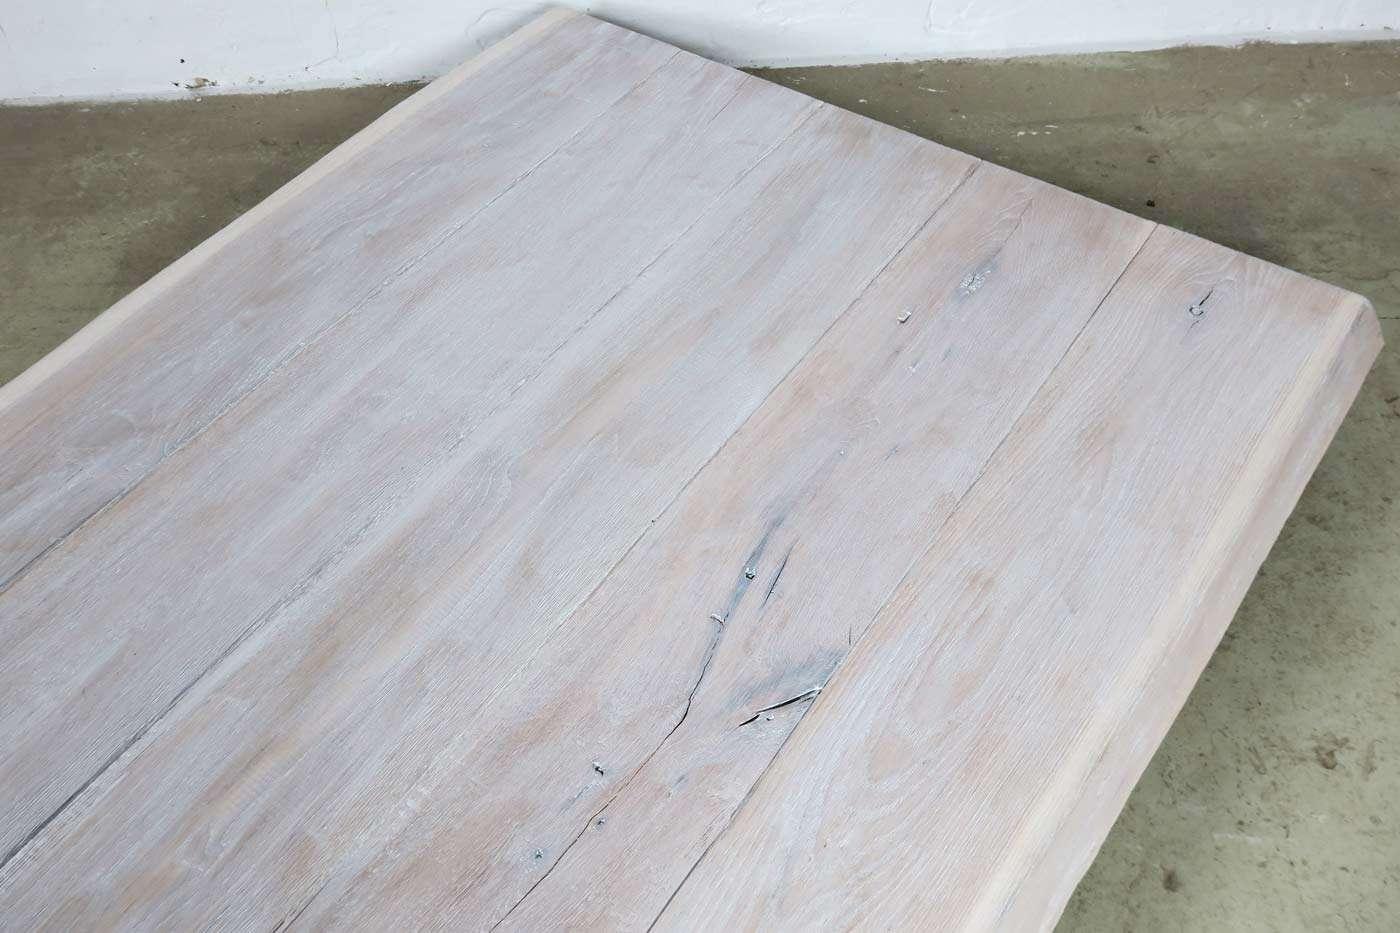 tischplatte eiche wei 202x108x5cm unikat 22111. Black Bedroom Furniture Sets. Home Design Ideas